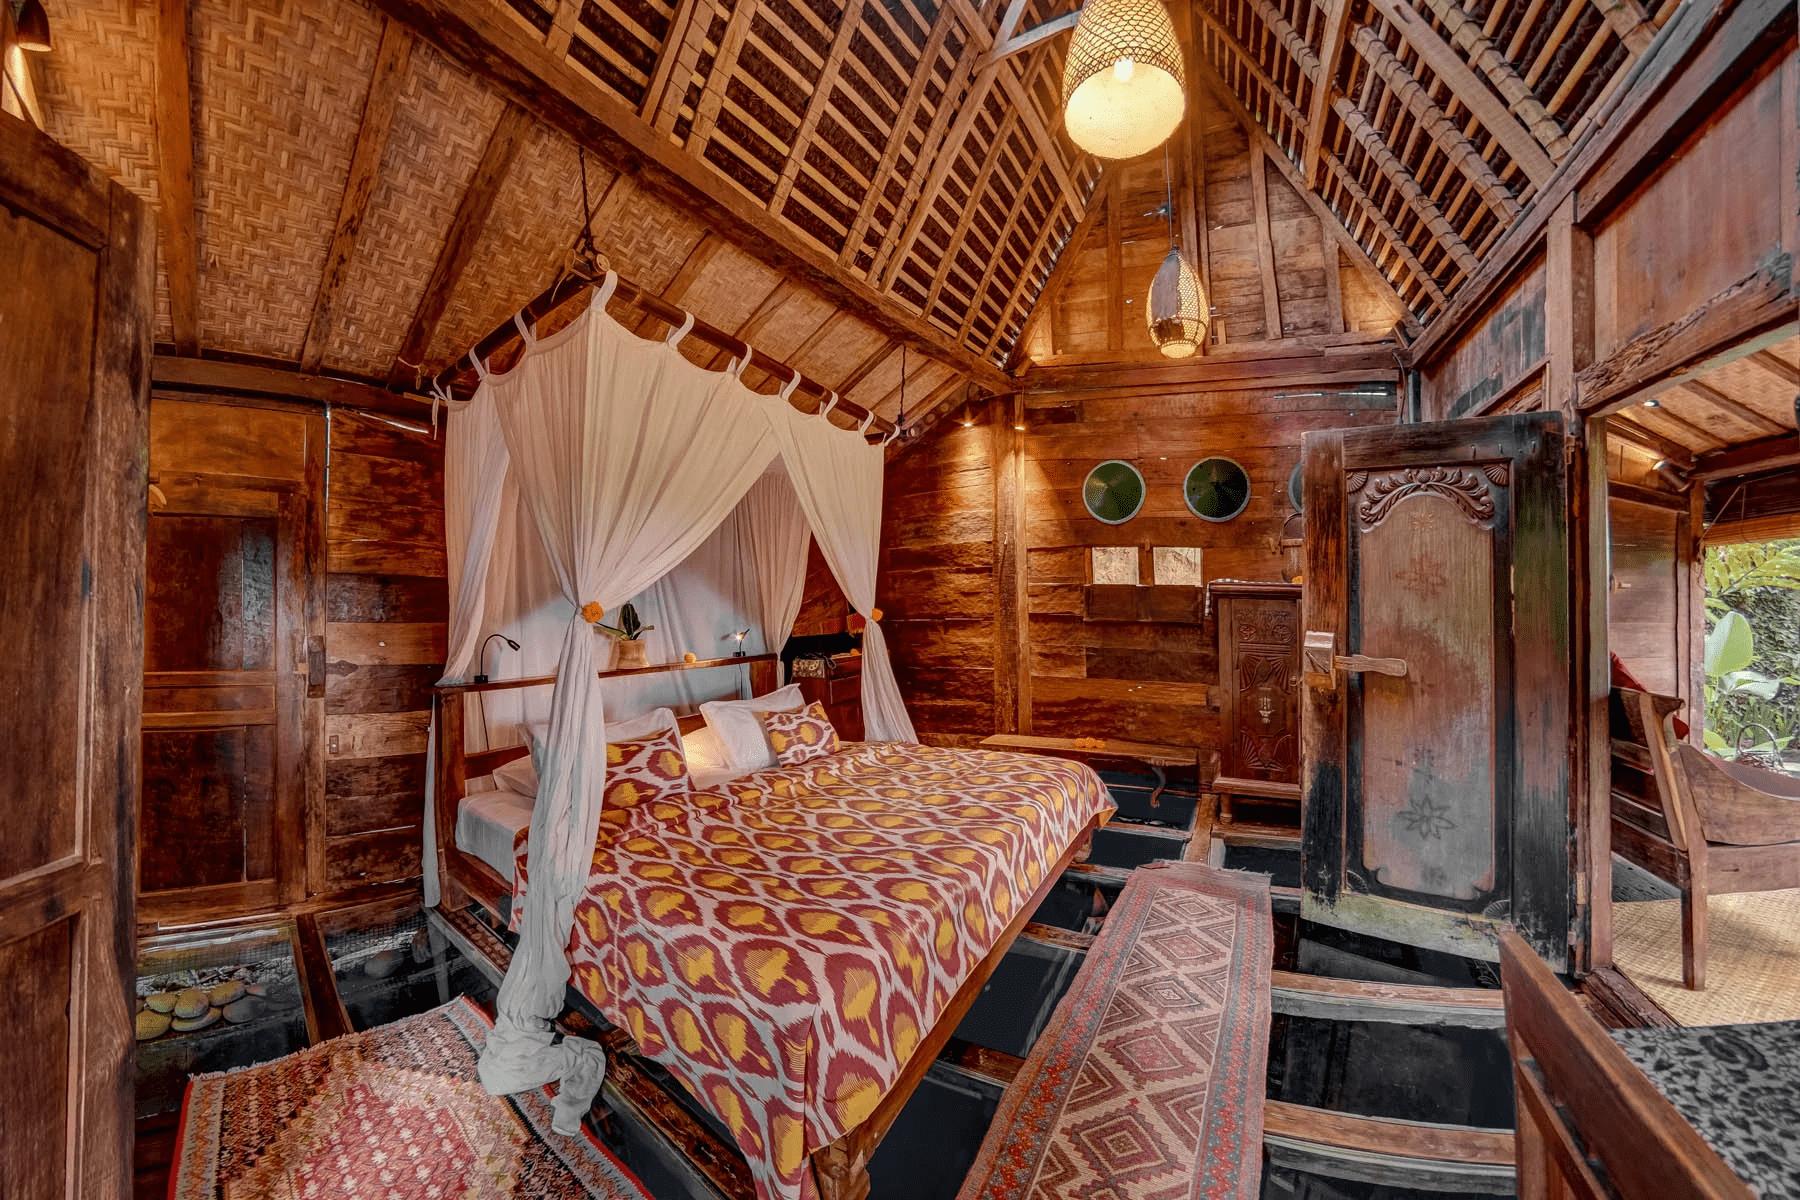 underwater hotels - Bambu Inda Hotel, Bali